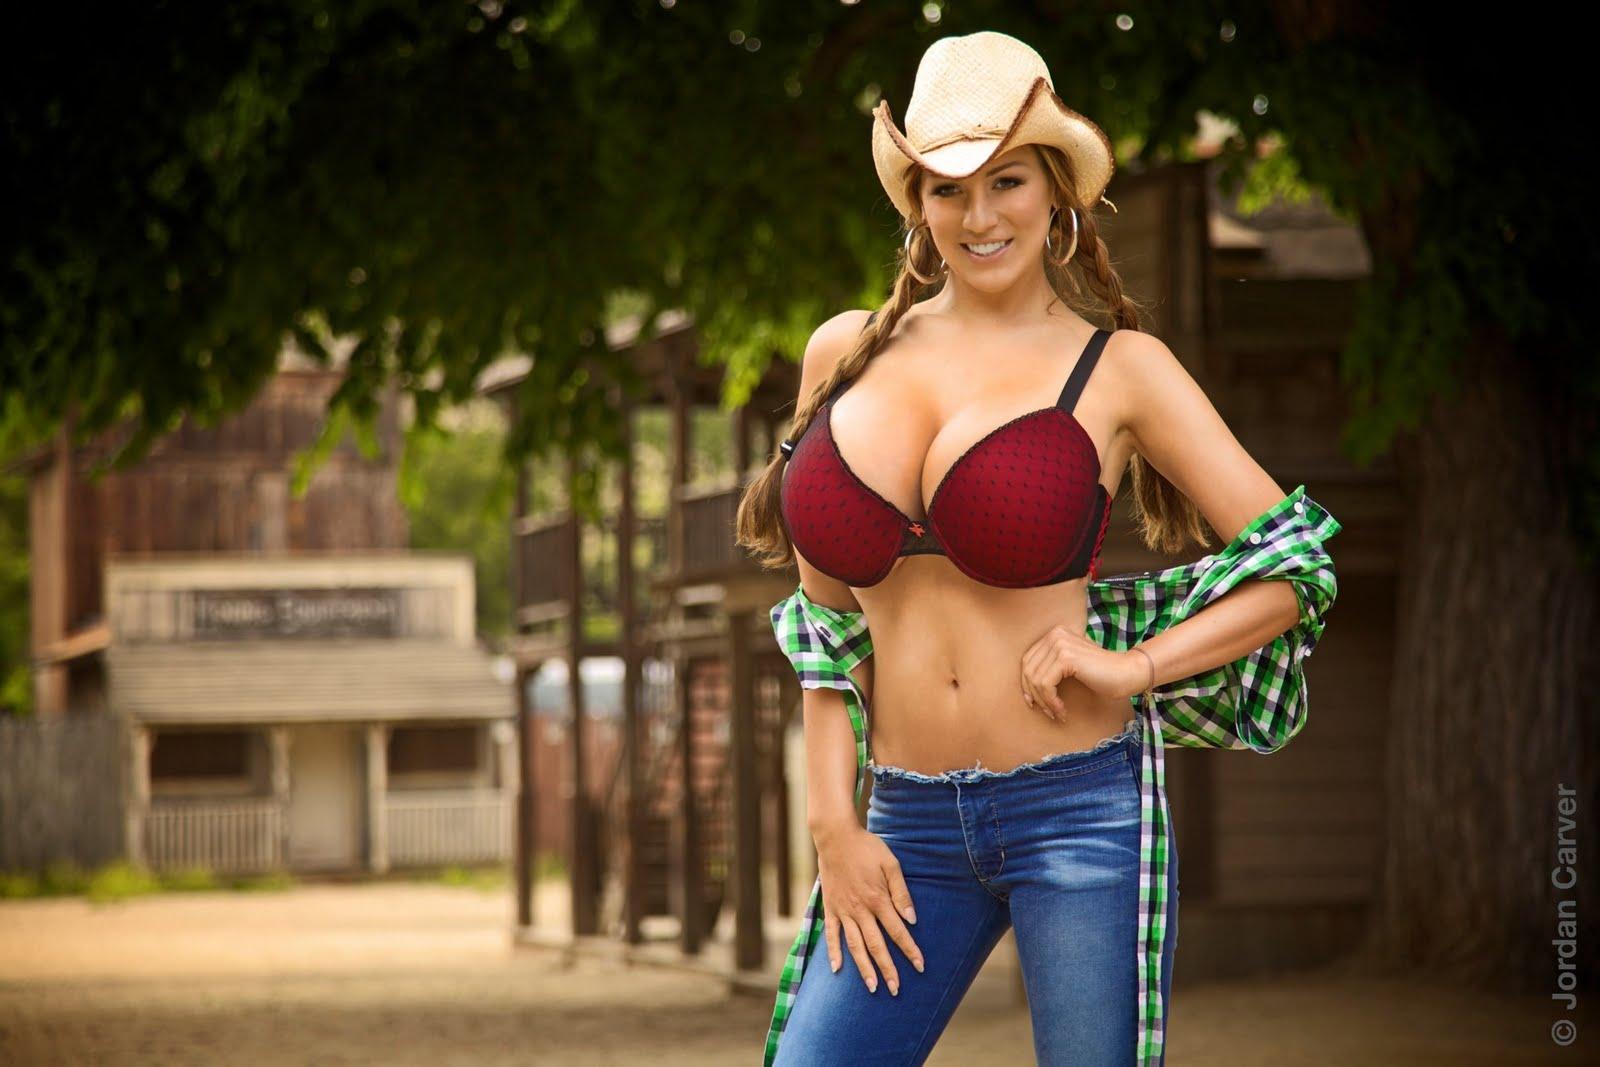 http://1.bp.blogspot.com/_cyH_7sPxVcQ/TFNAwPUvnfI/AAAAAAAAEB4/TANsHlDRrLE/s1600/Jordan+Carver+cowgirl+photoshoot+%289%29.jpg